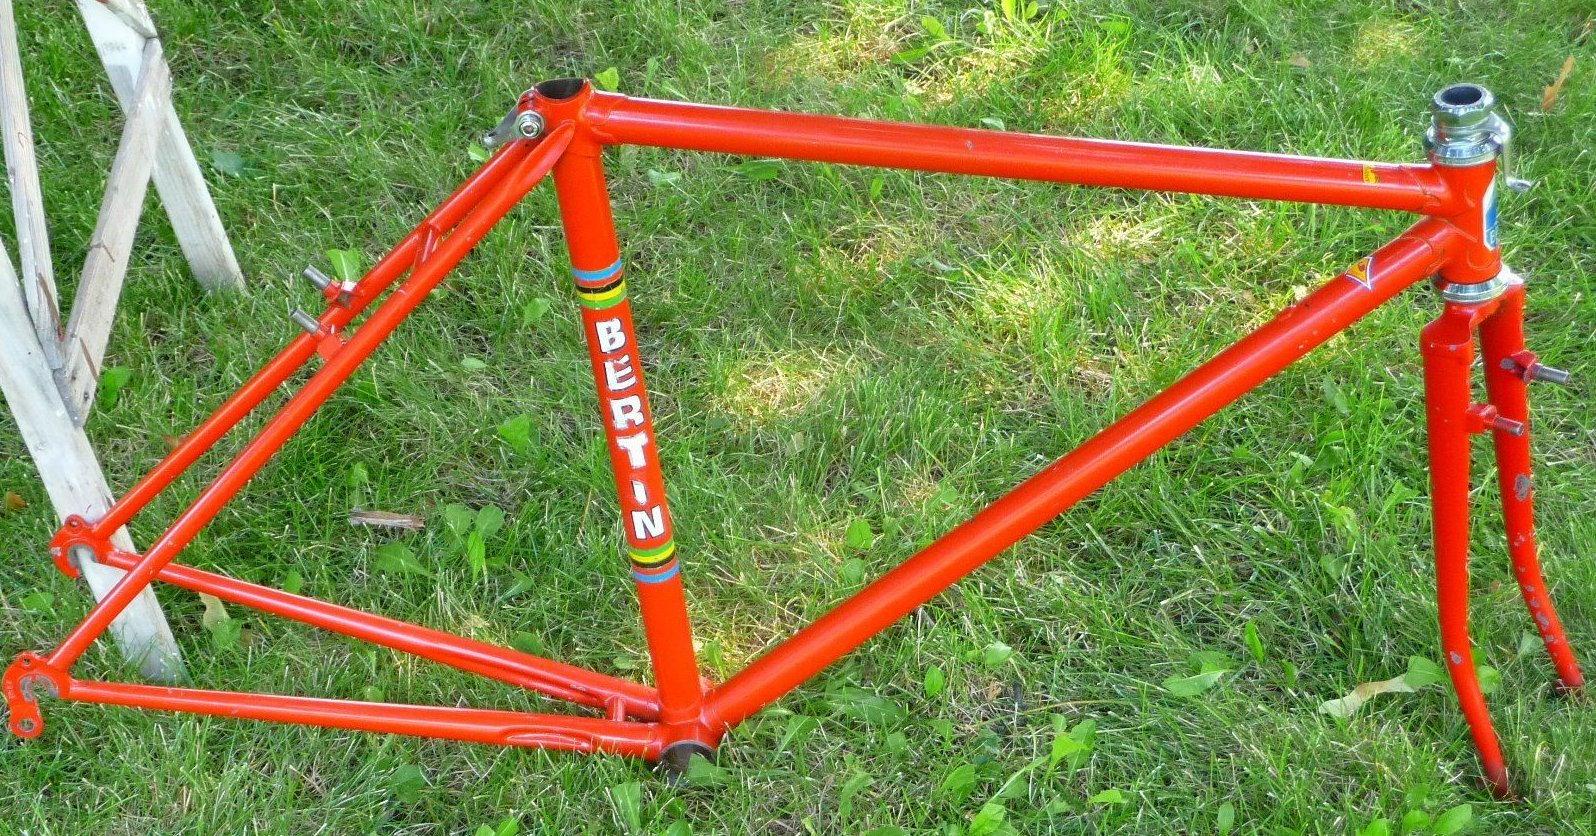 Mixte sizing? - Bike Forums